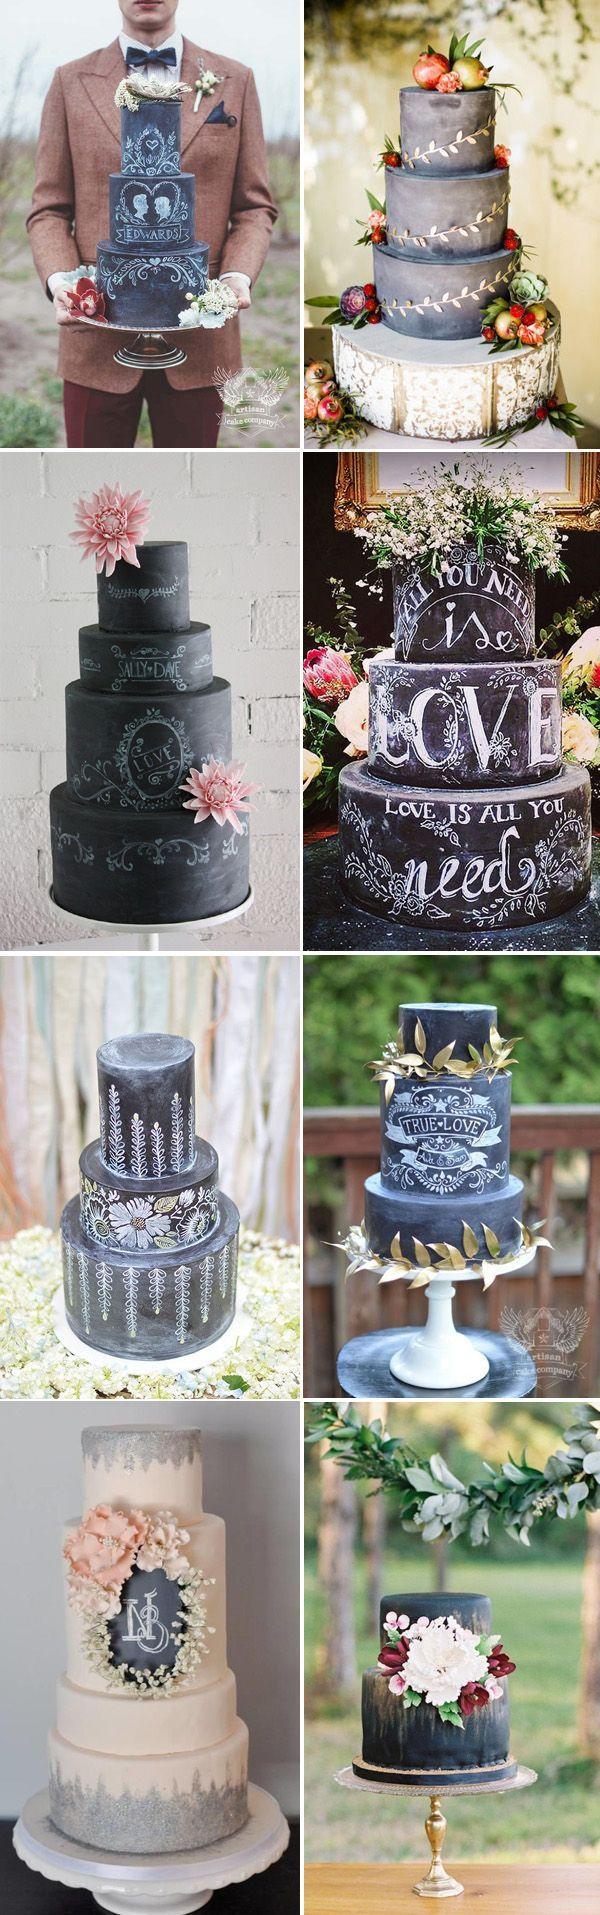 Rustic Wedding Cake Ideas - Black and White Chalkboard Wedding Cakes